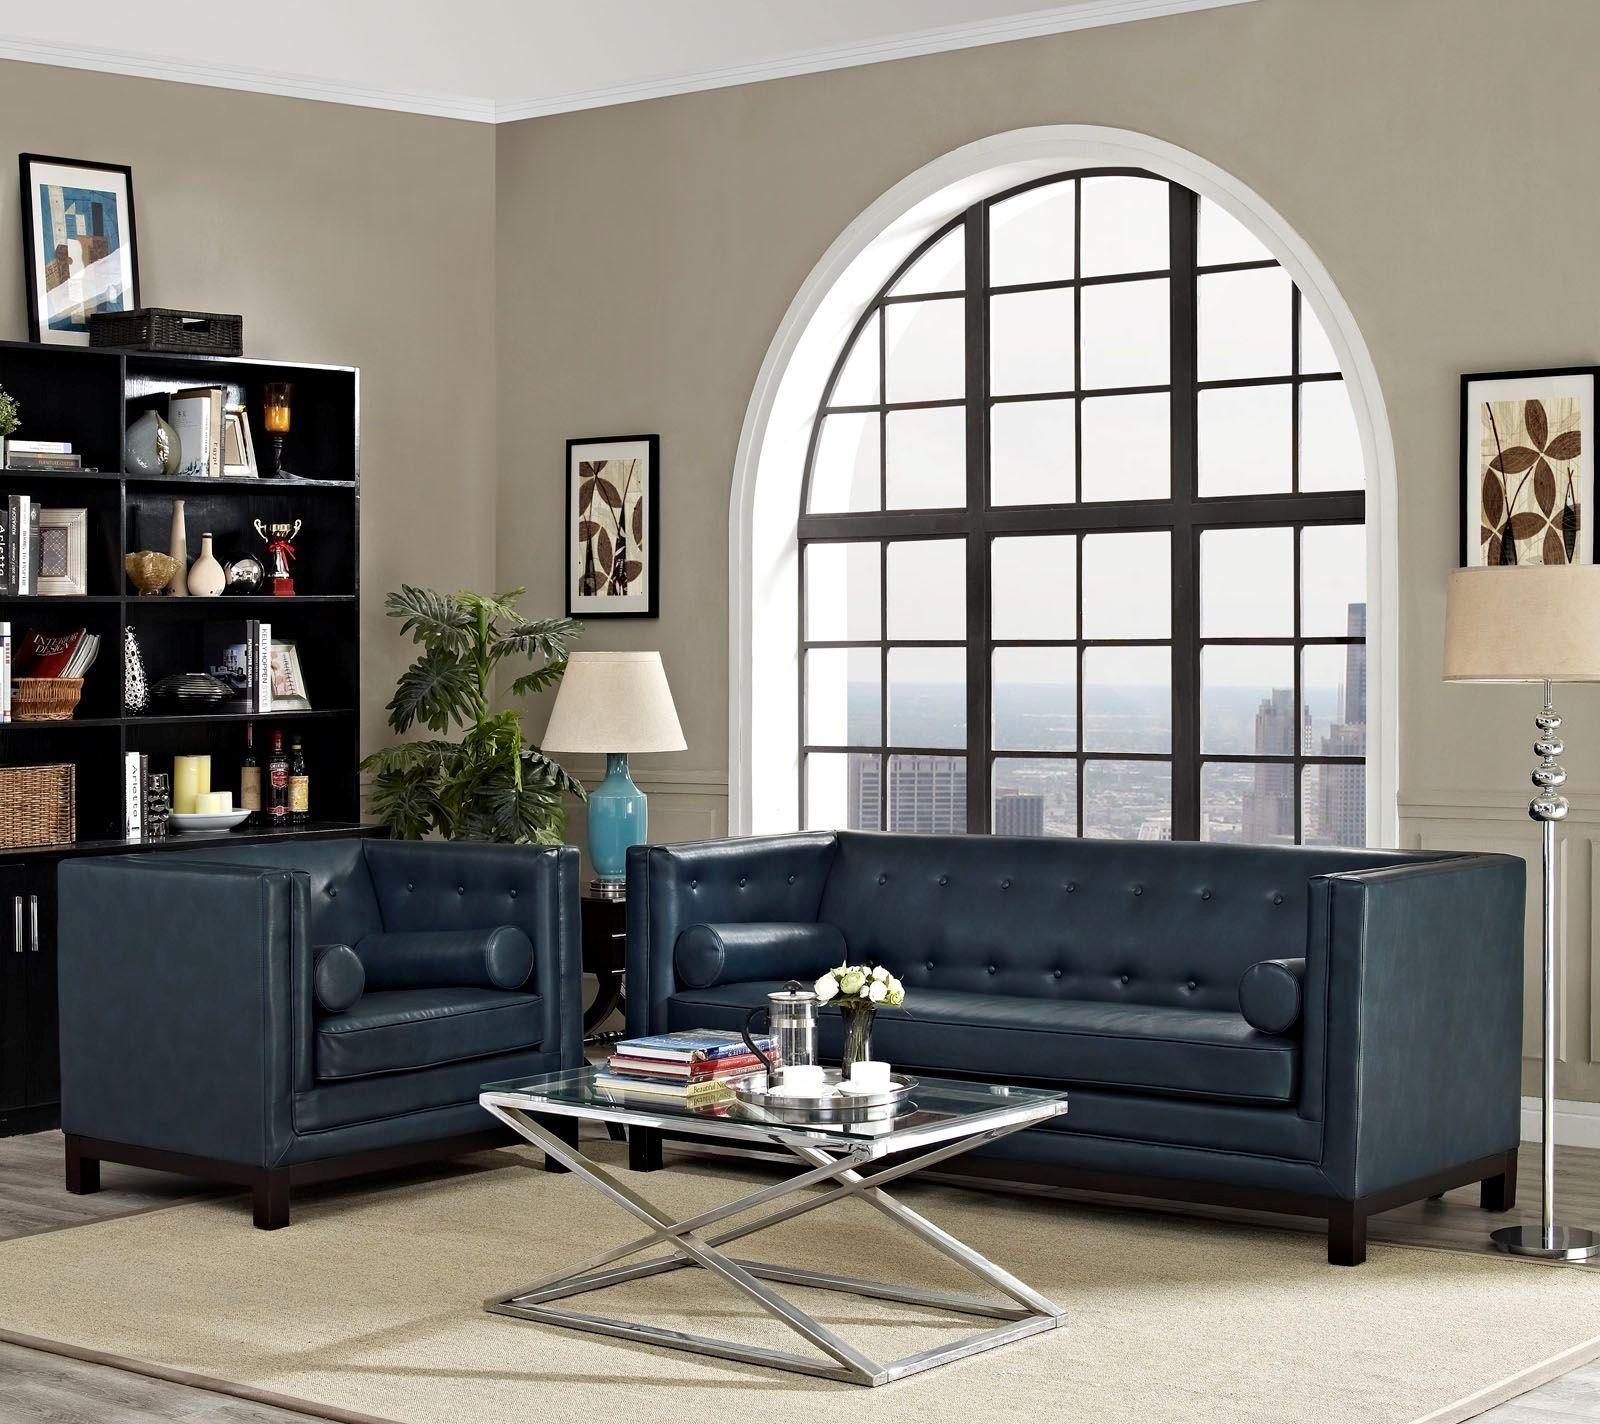 Imperial blue 2 piece living room set eei 1781 blu set for 2 piece living room set